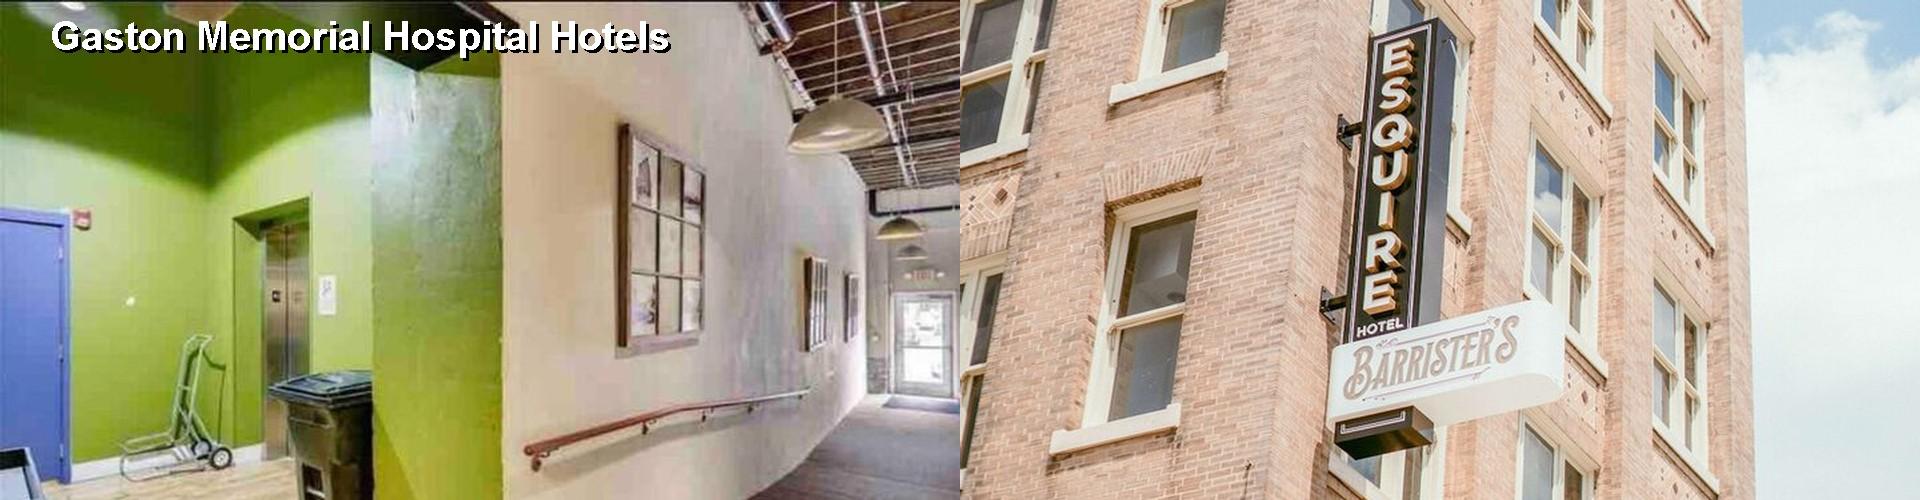 5 Best Hotels Near Gaston Memorial Hospital